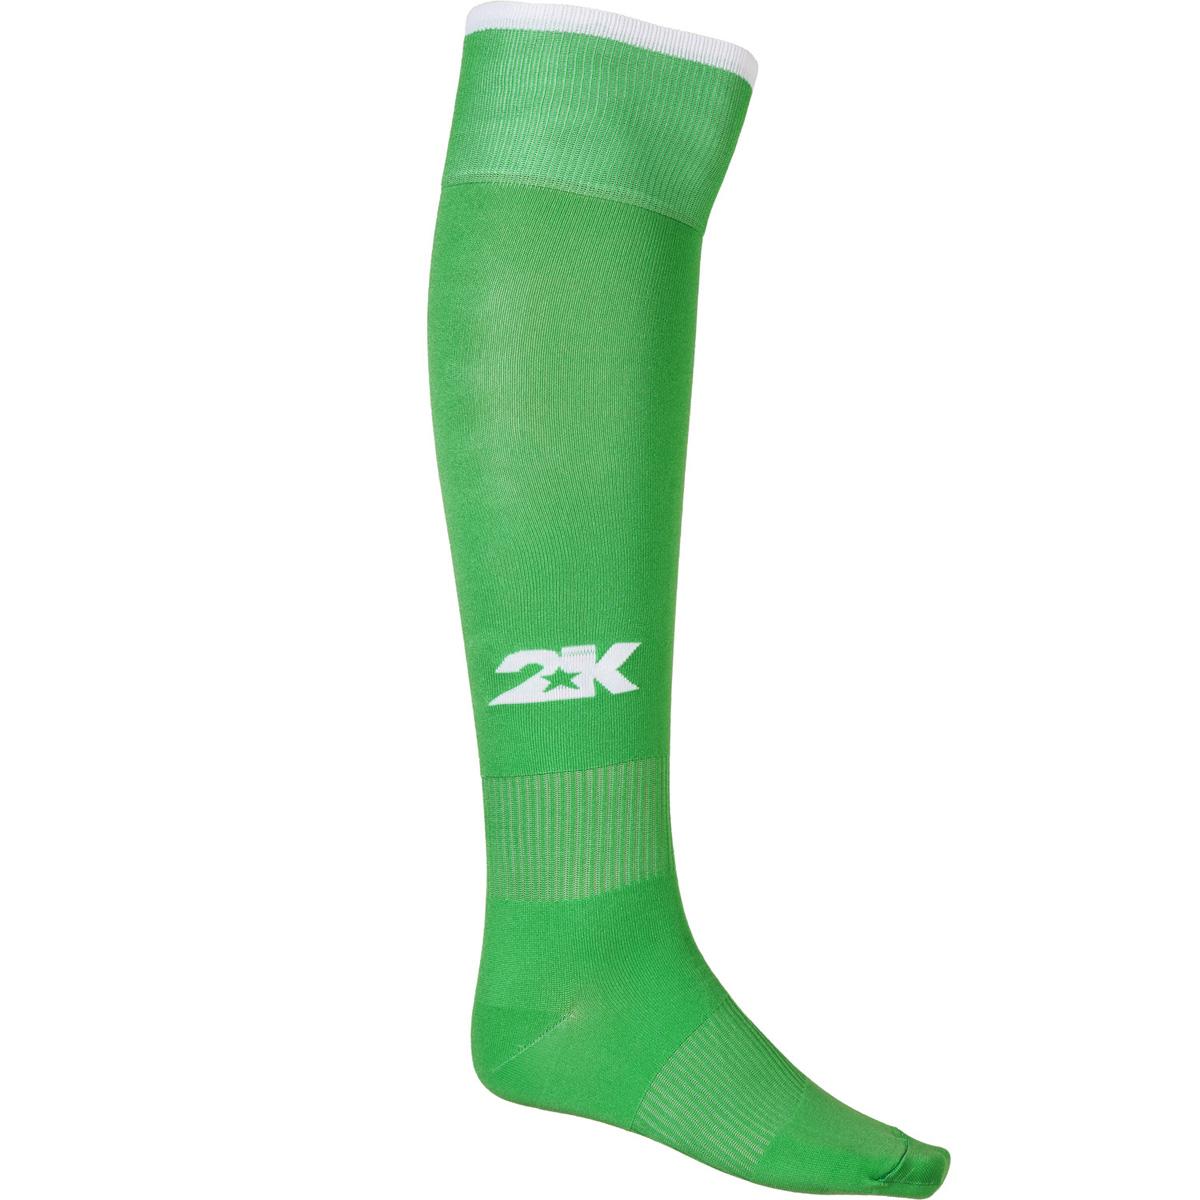 Гетры футбольные 2K Sport Classic, цвет: зеленый, белый. 120334. Размер 36/40